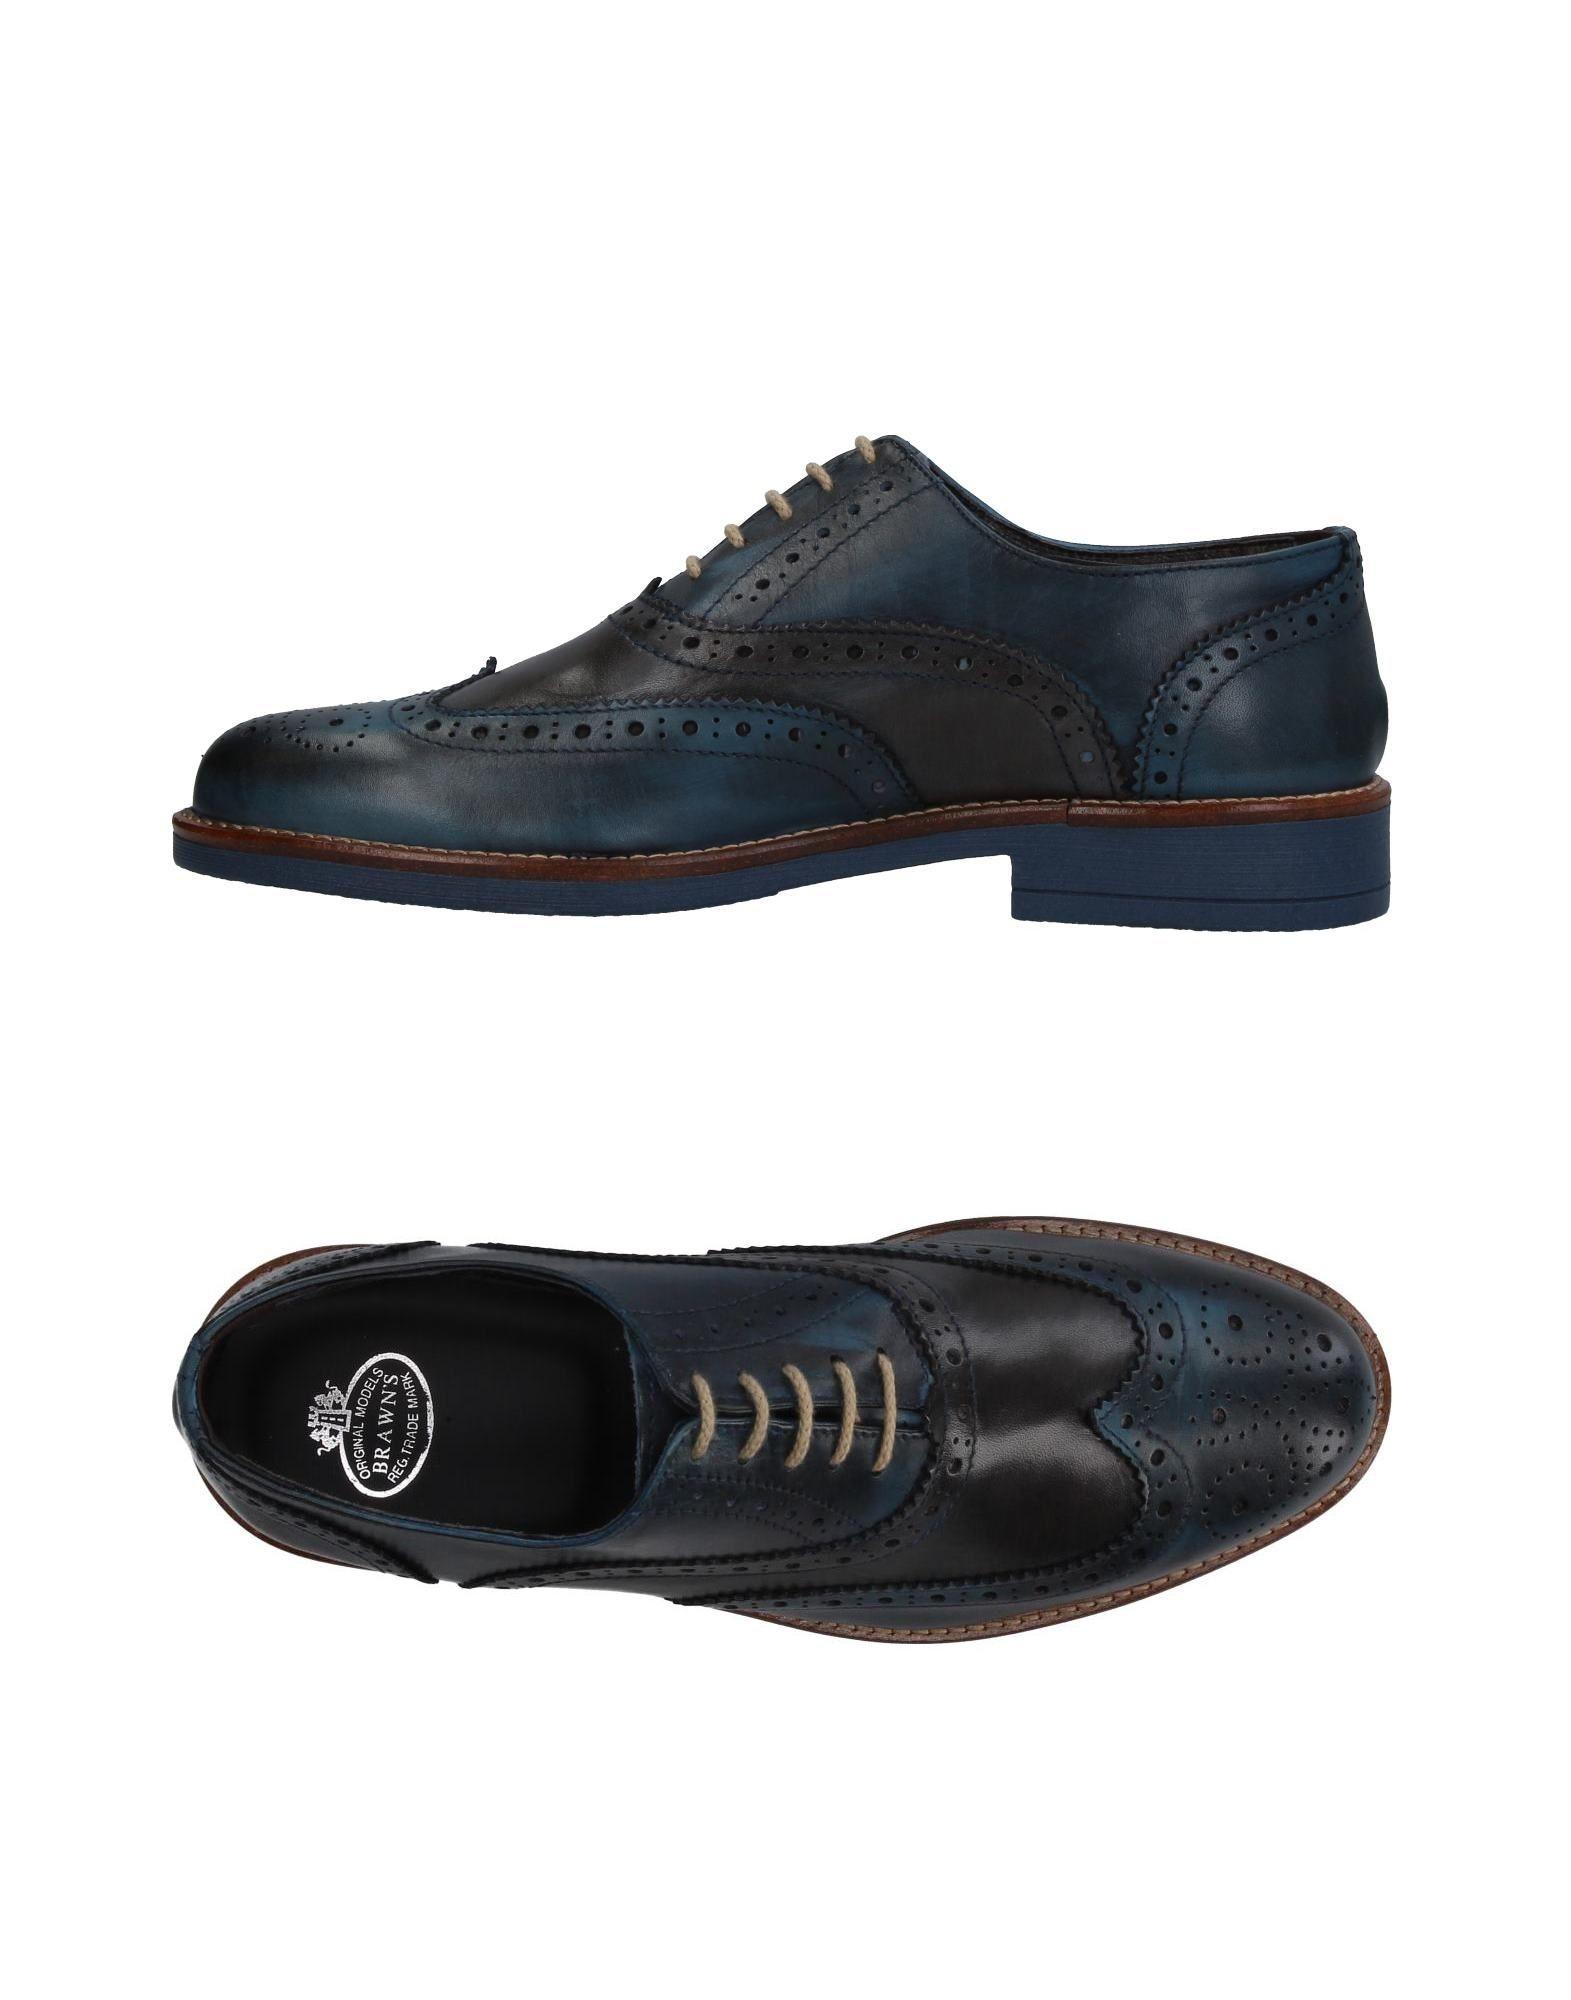 Rabatt echte Schuhe Brawn's Schnürschuhe Herren  11411651HM